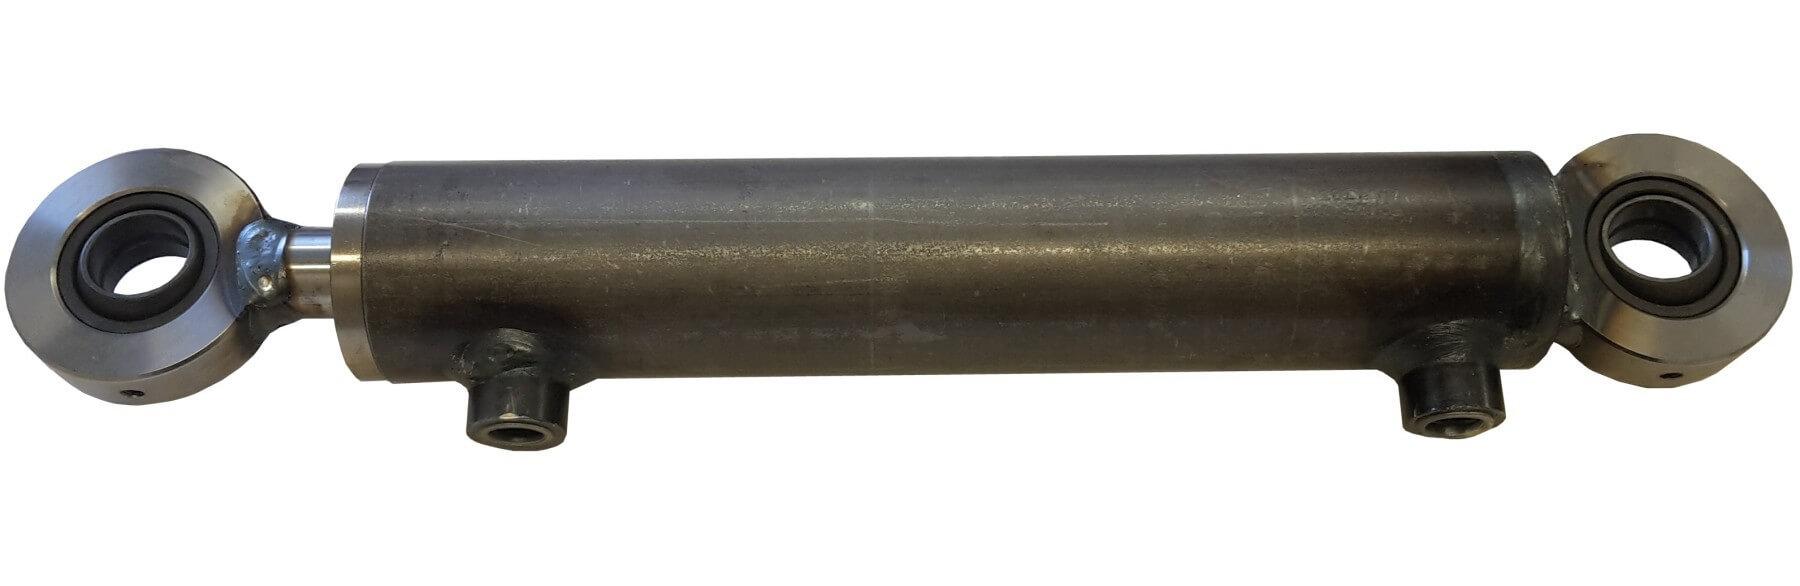 Hydraulisylinteri CL 60. 30. 350 GE